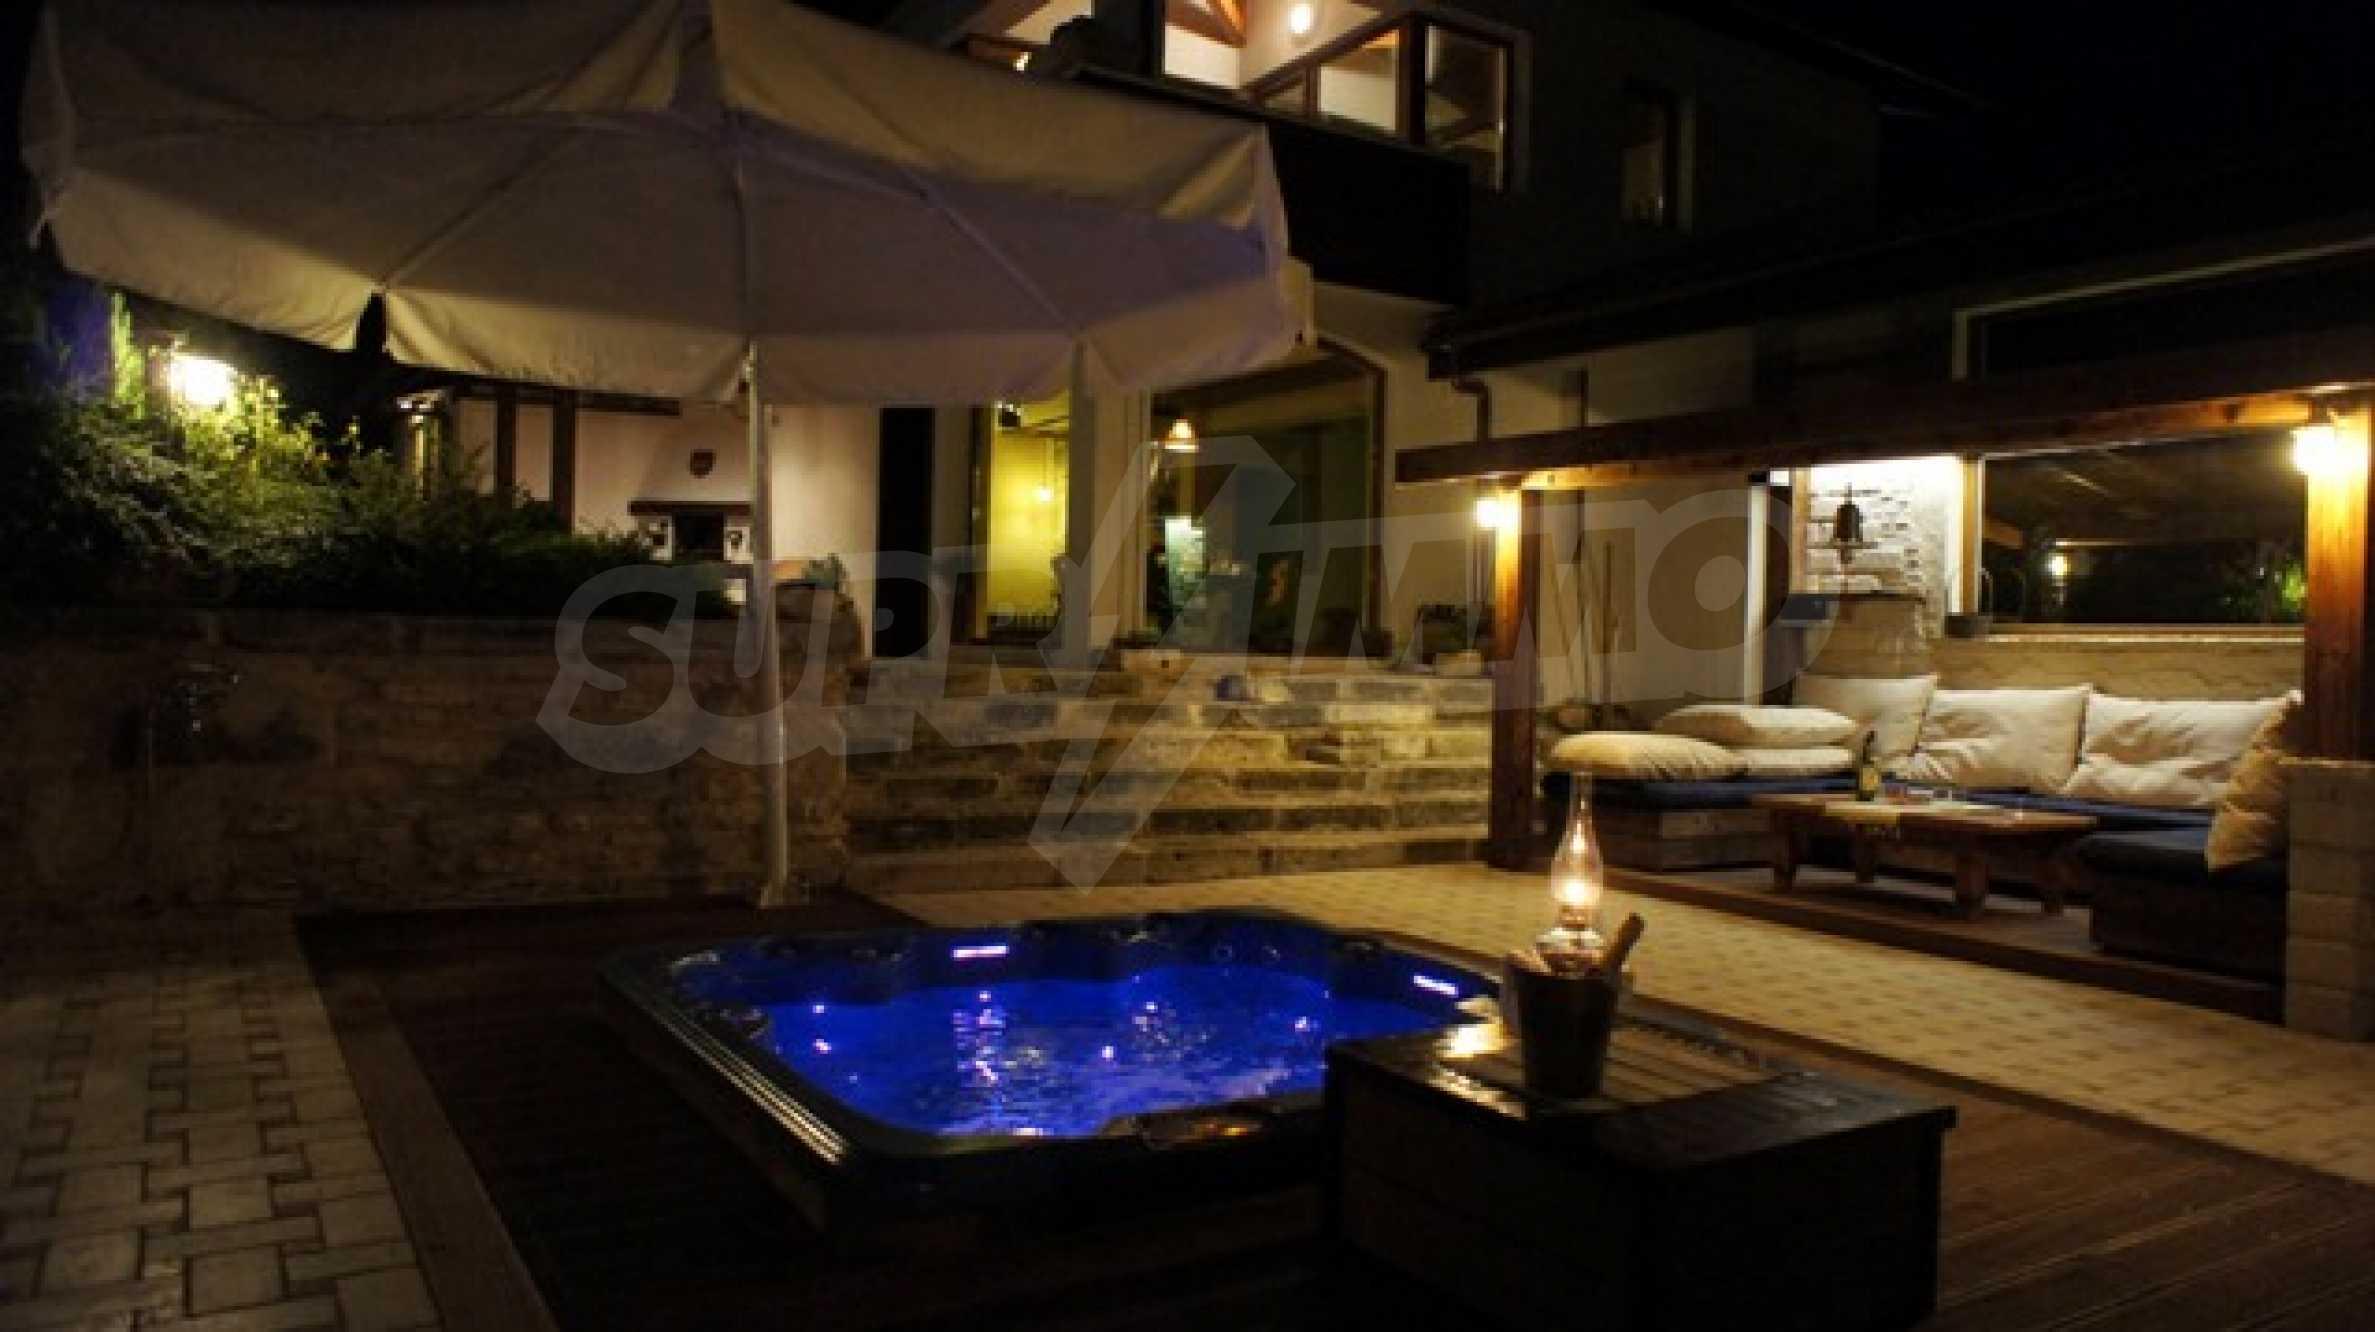 The Mediterranean style - a sense of luxury 57